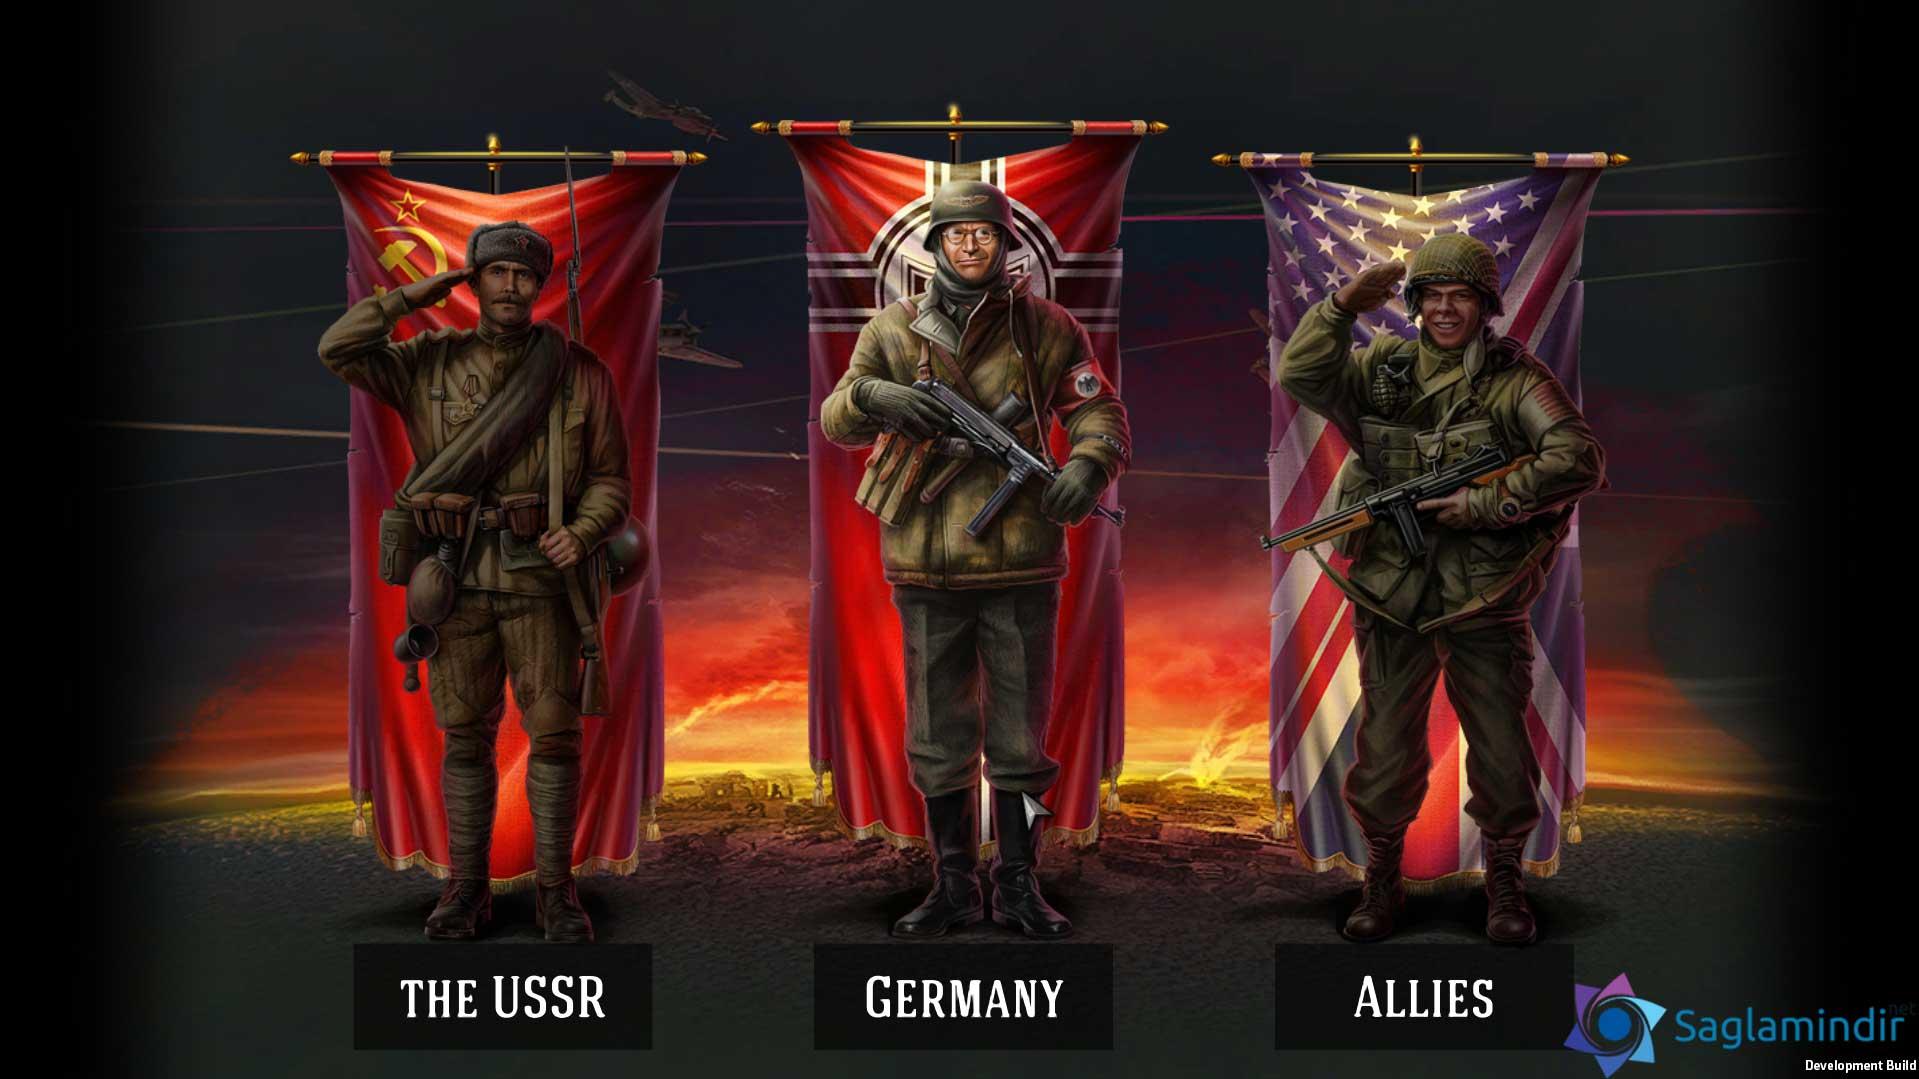 Third Front WWII saglamindir